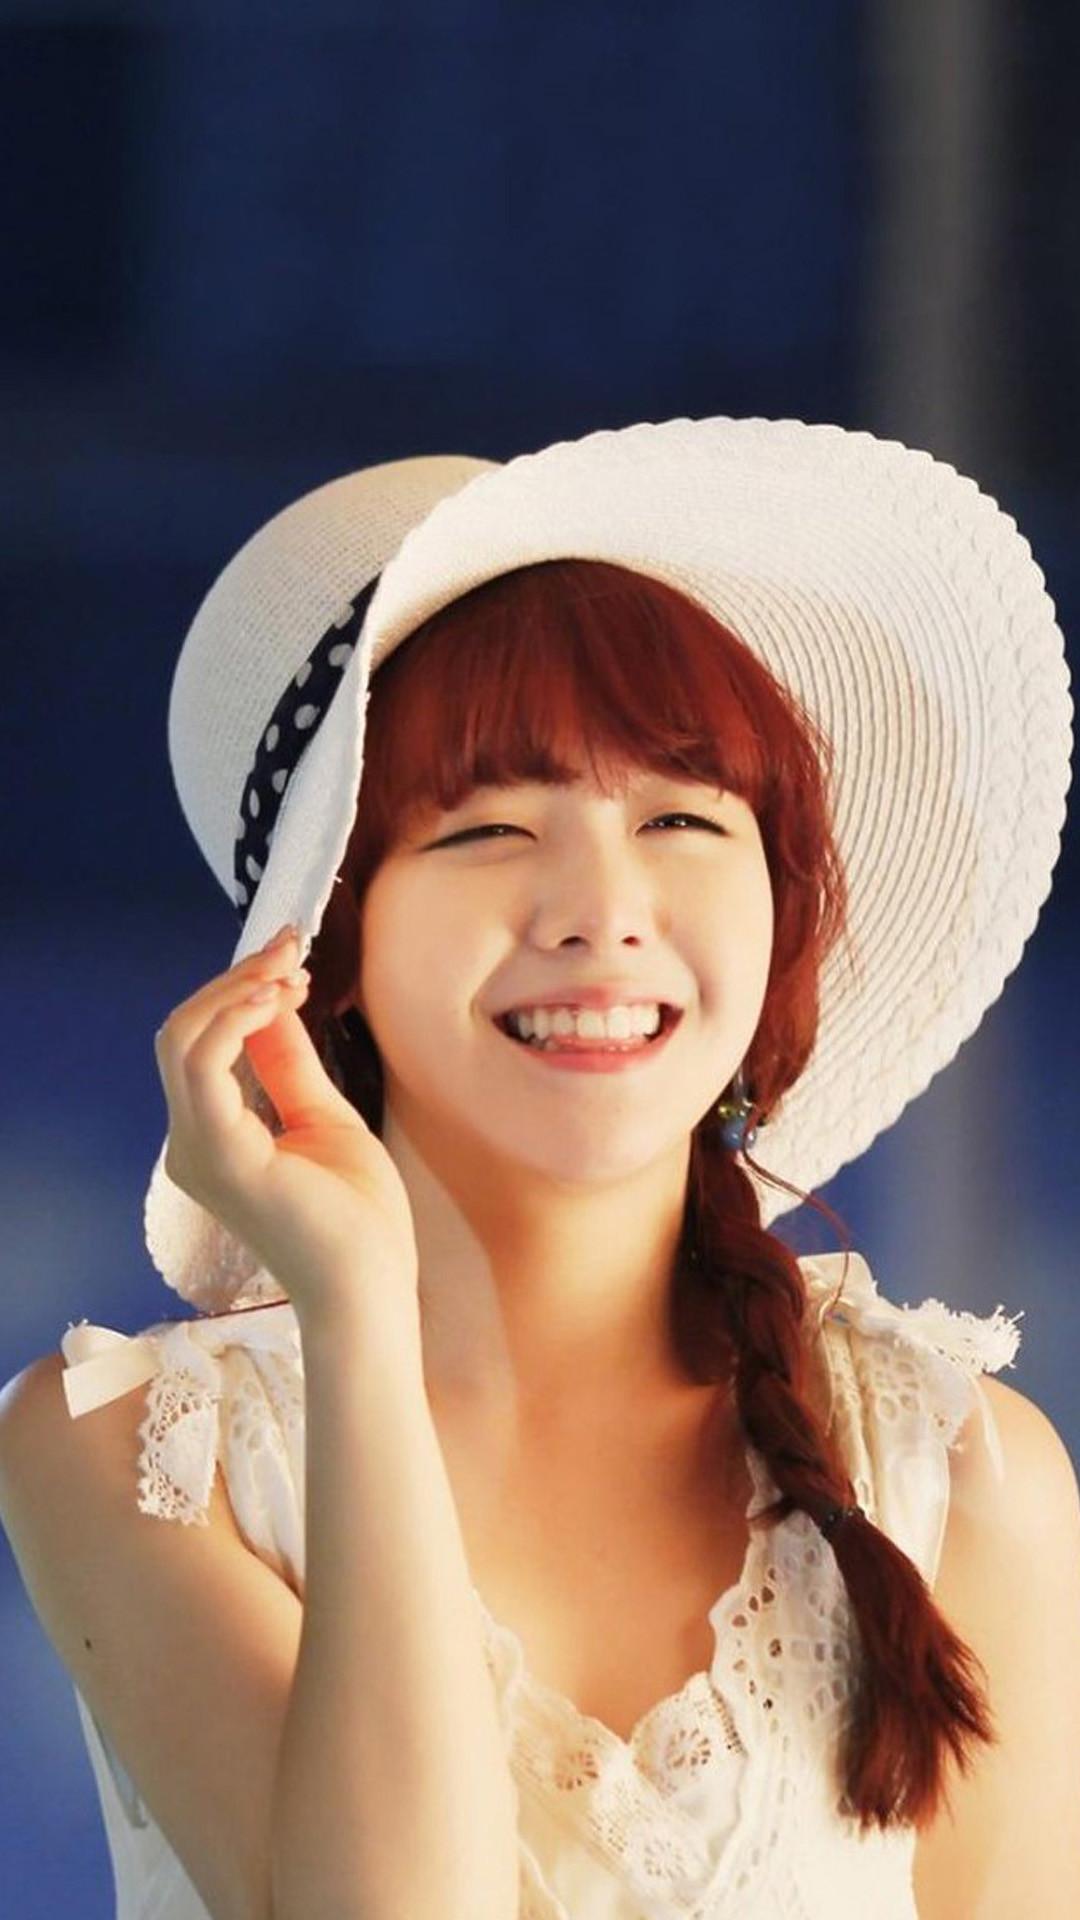 Hat girl LG G2 Wallpapers